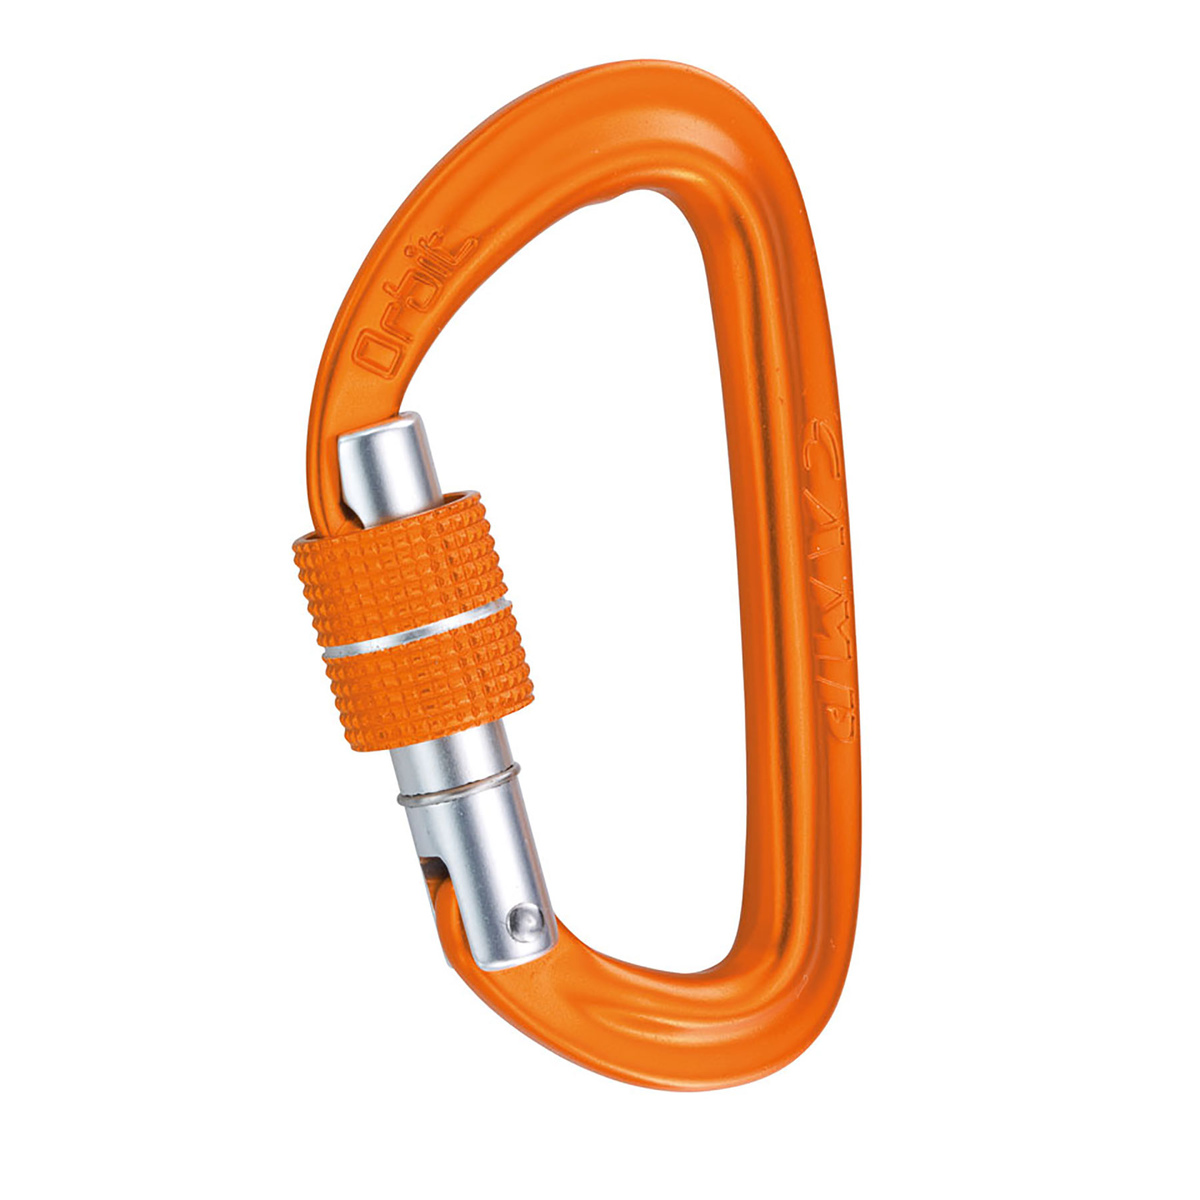 Orbit lock - arancione